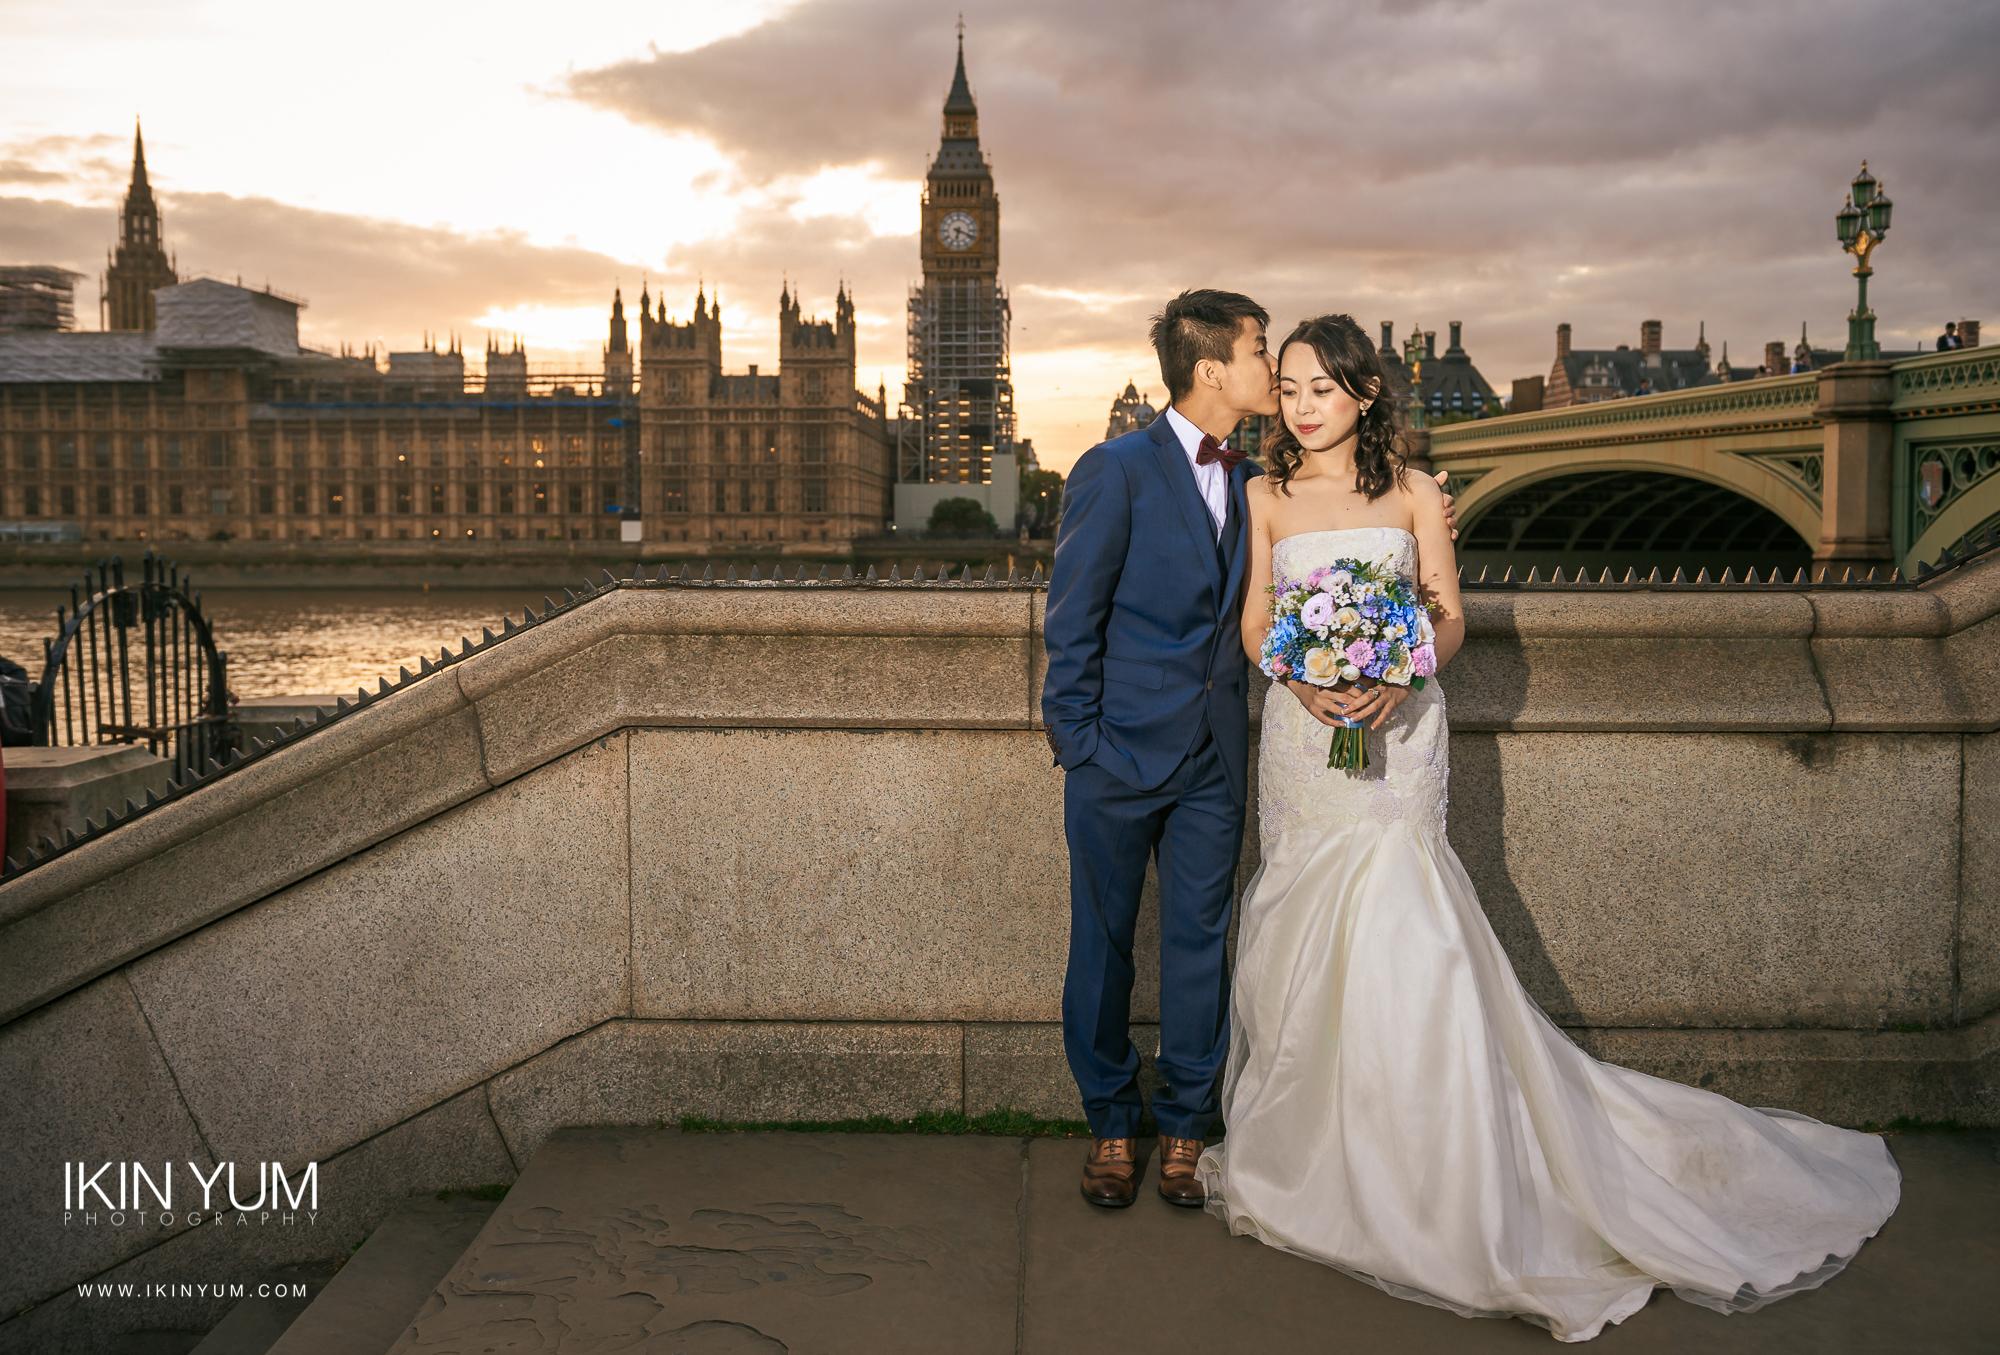 Chloe & Carlos Pre-Wedding Shoot- Ikin Yum Photography-0128.jpg